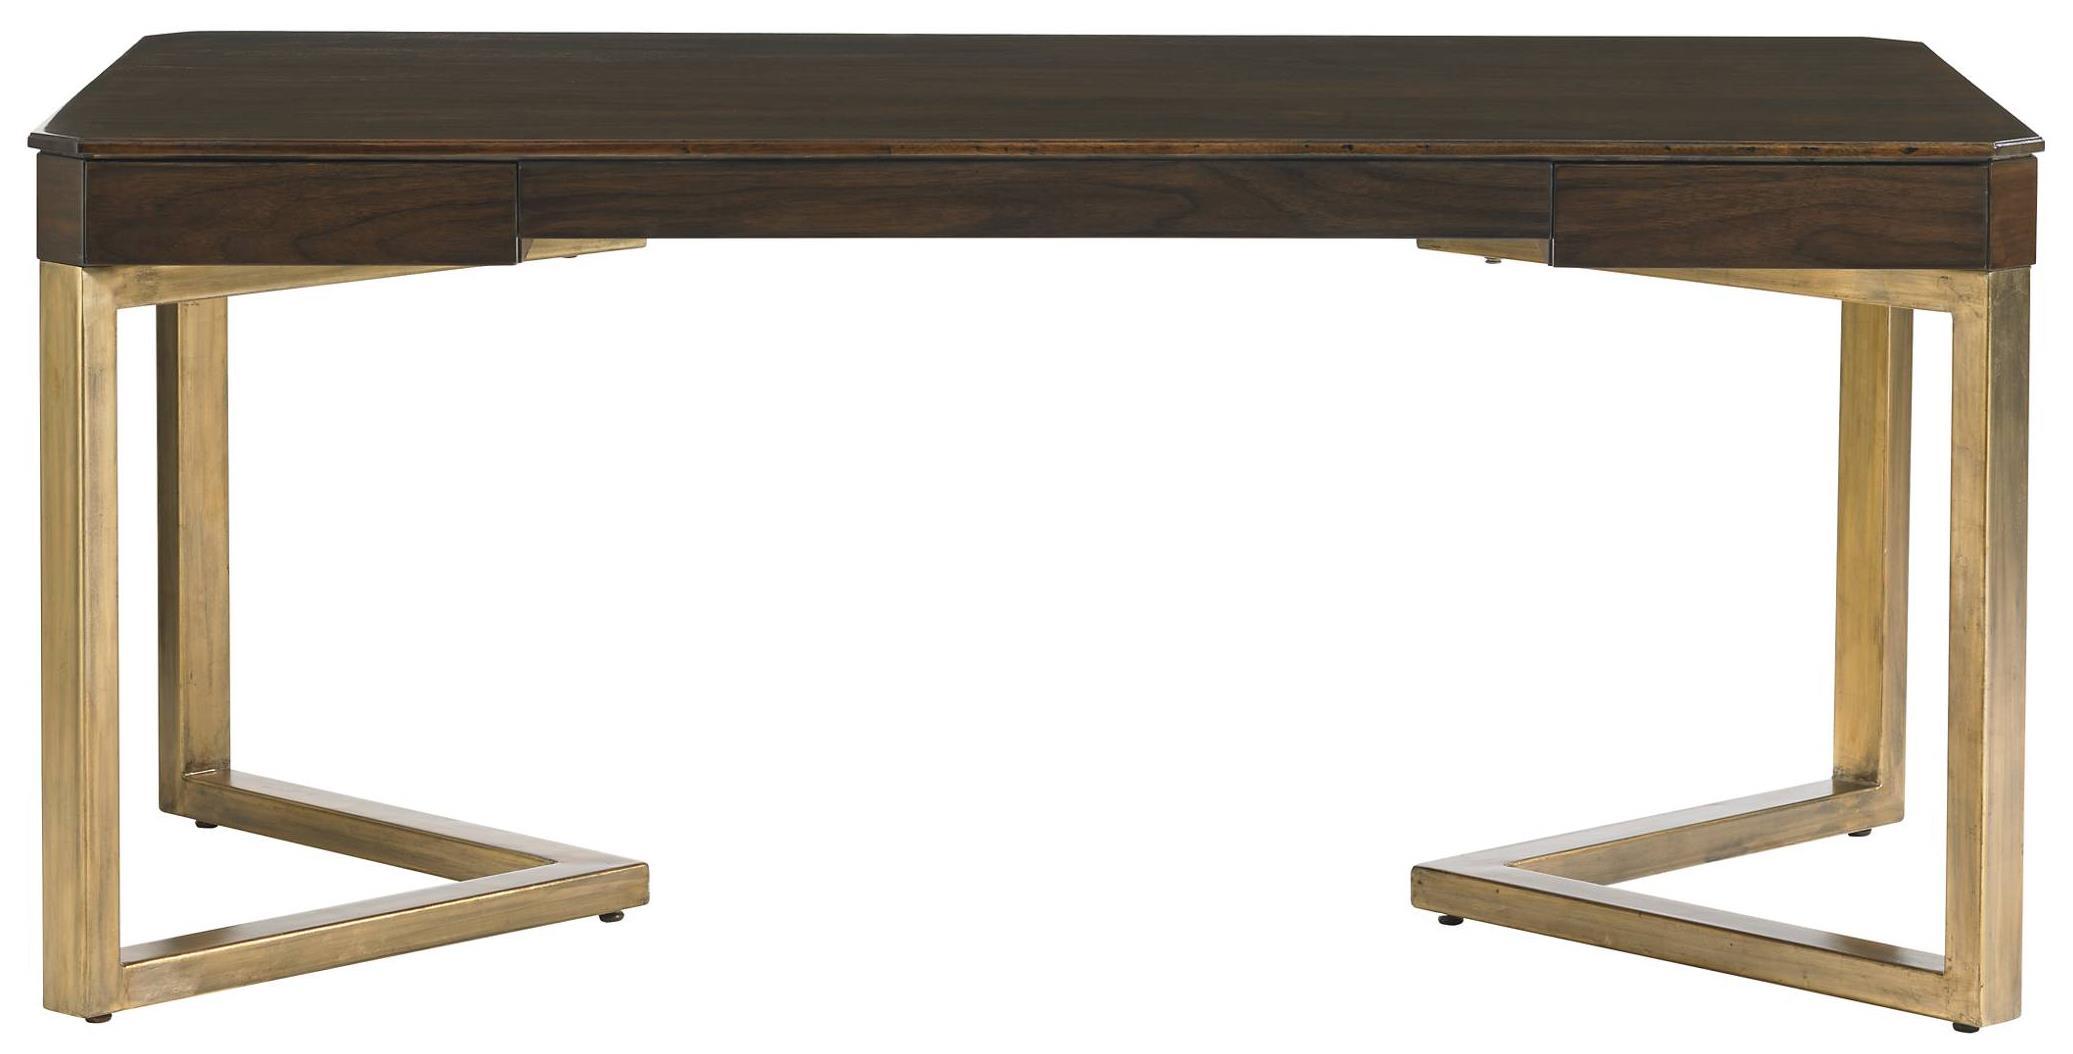 Stanley Furniture Crestaire Mid Century Modern Vincennes Writing Desk With  Angled Gold Leaf Finish Legs   Baeru0027s Furniture   Table Desks/Writing Desks